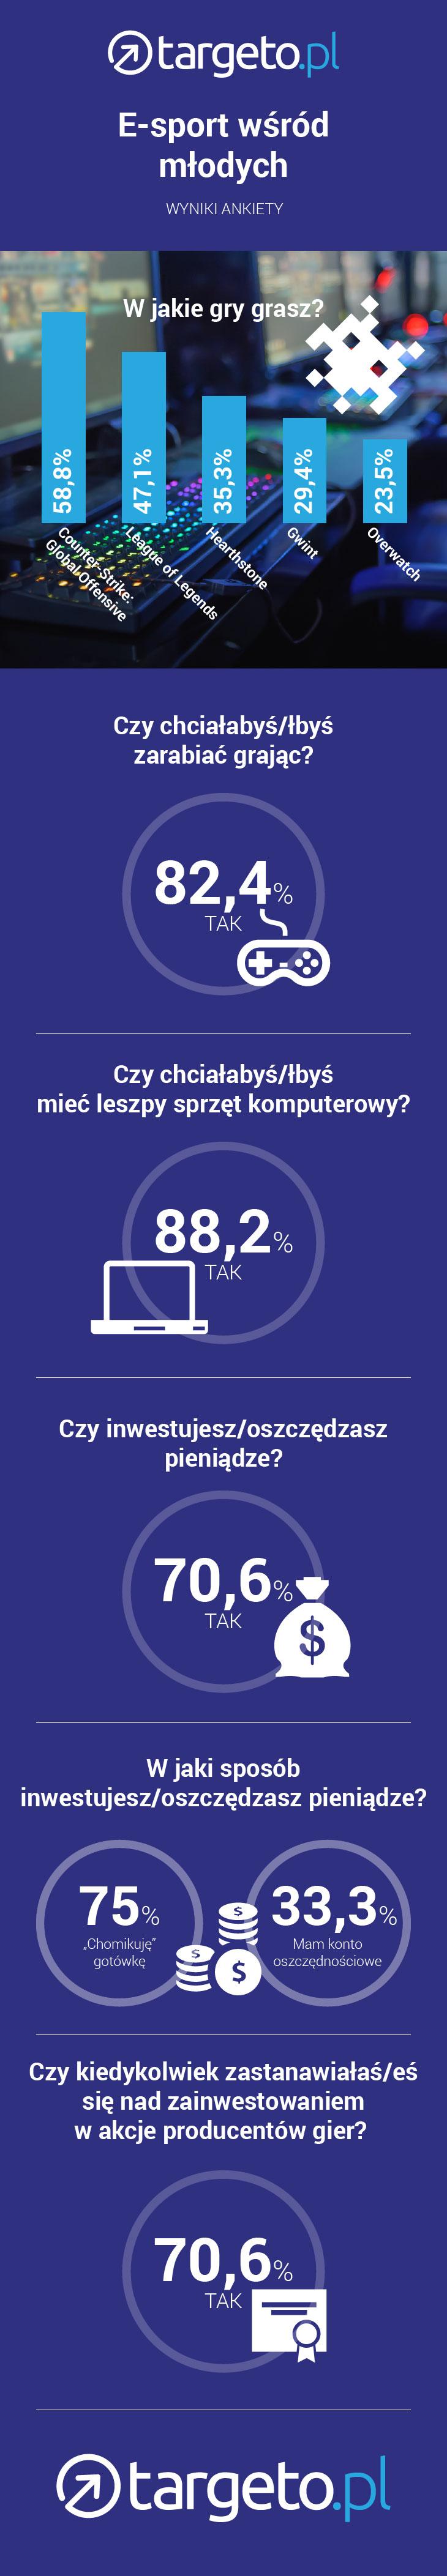 targeto-infografika-ankieta-gracze